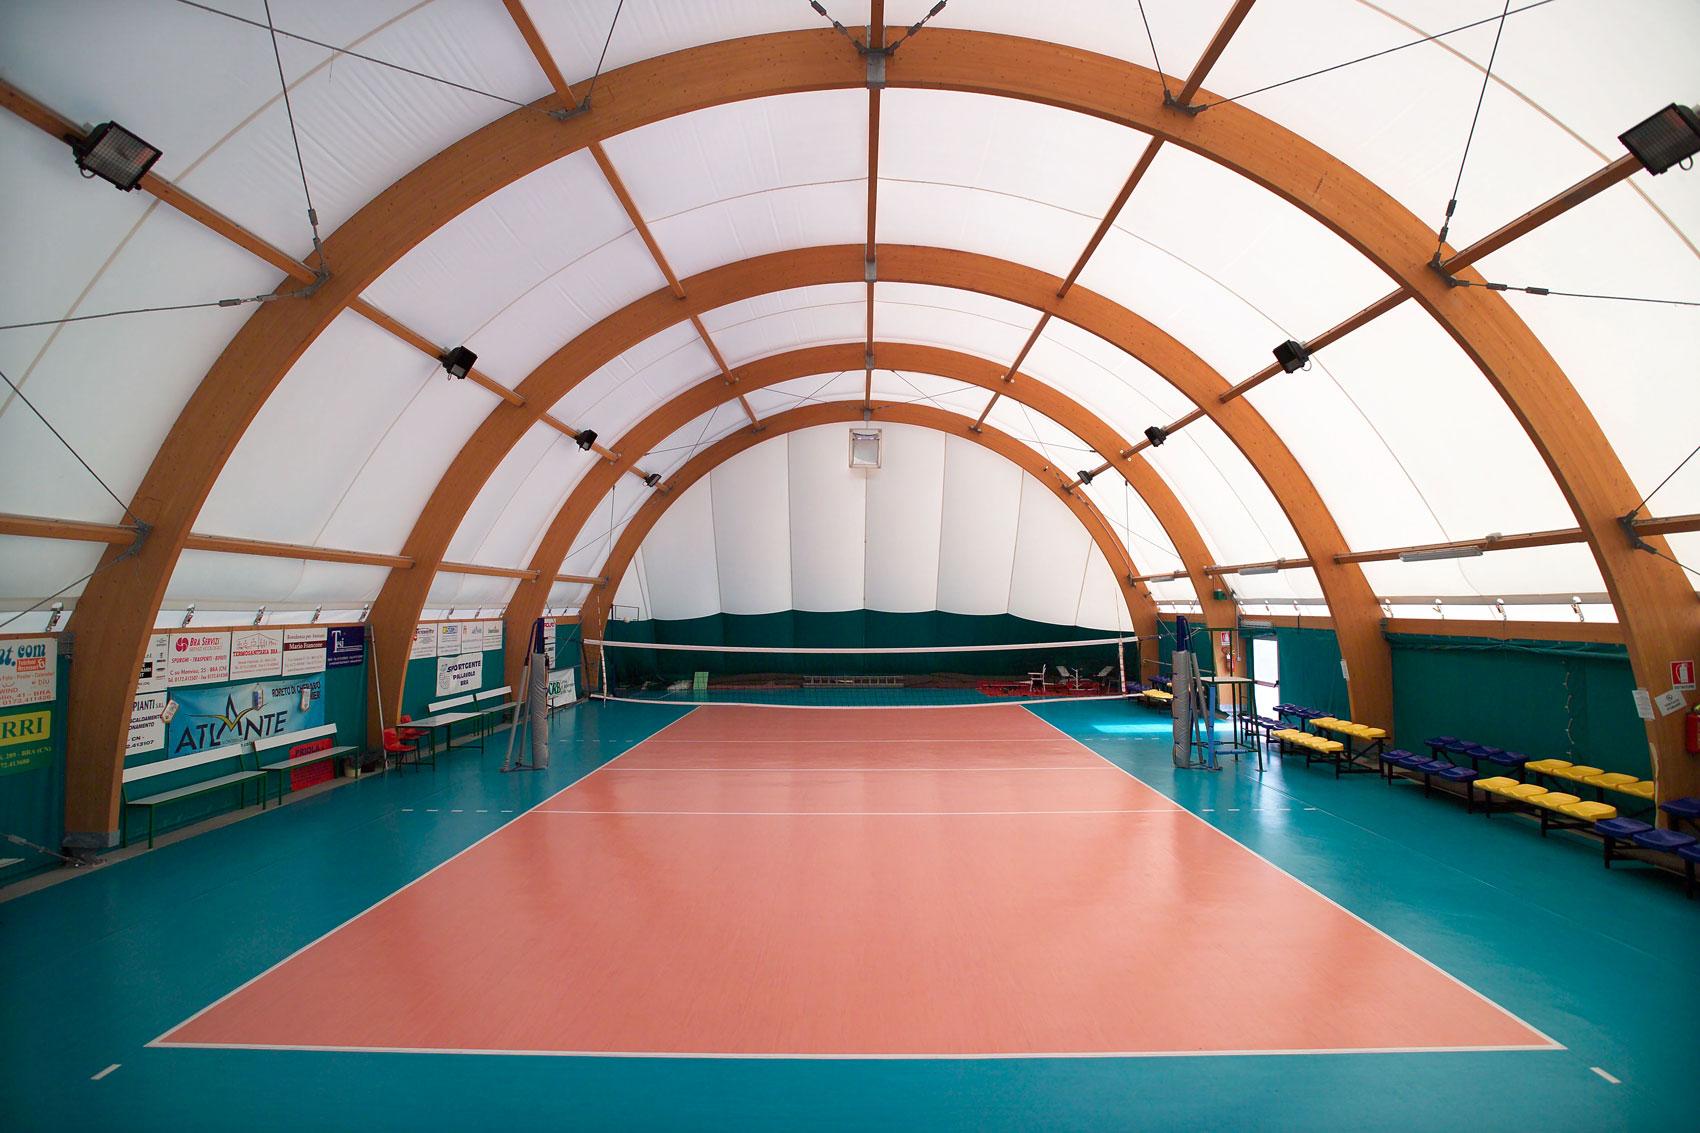 Palestra Associazione Sportiva  Sportgente, Bra, Italia